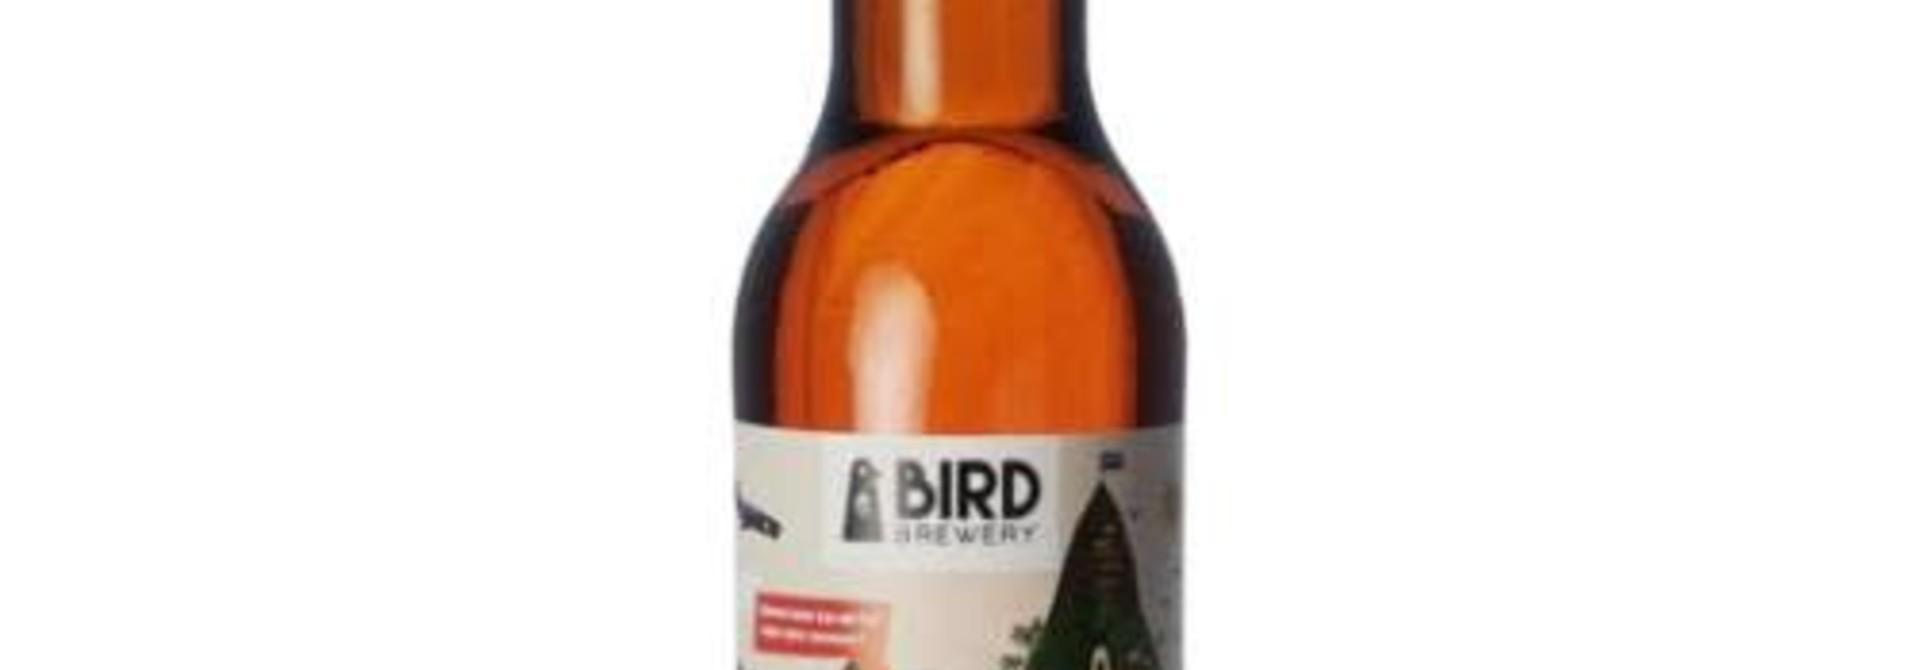 BIRD BREW FUUT FIEUW 33CL